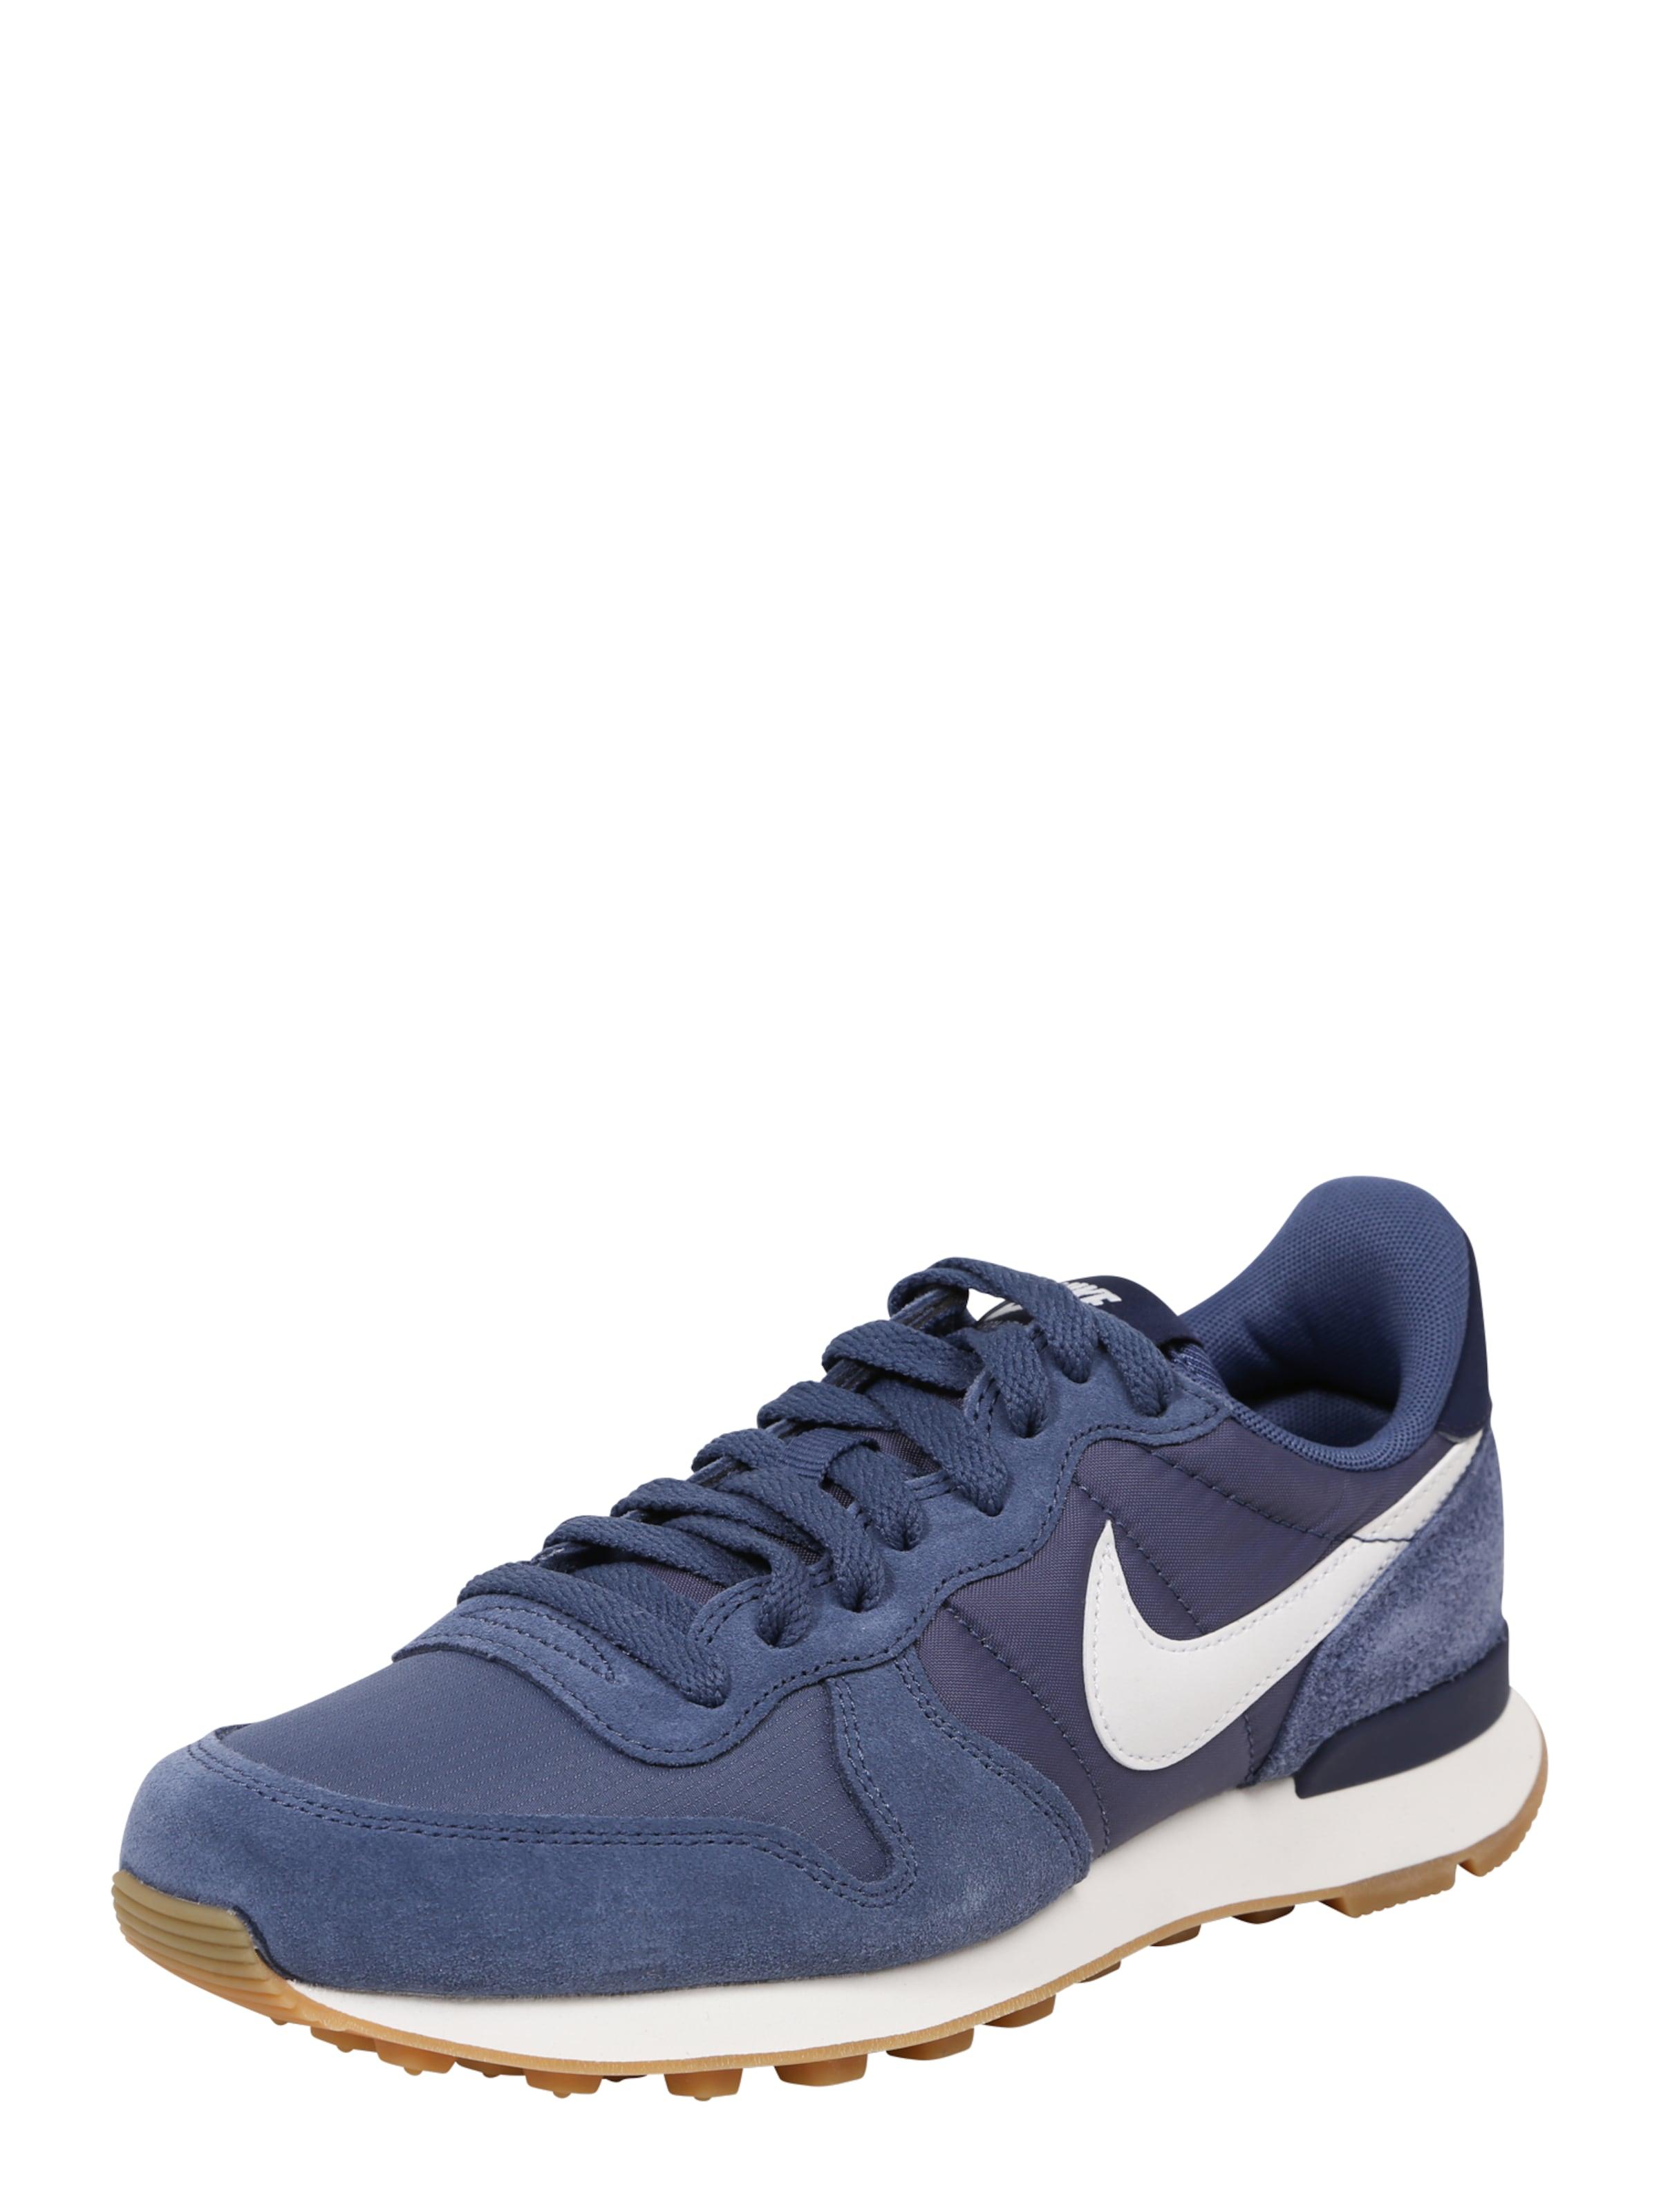 Nike Sportswear Sneaker 'Internationalist' Größte Anbieter Online Freies Verschiffen 100% Garantiert 3fpACr5